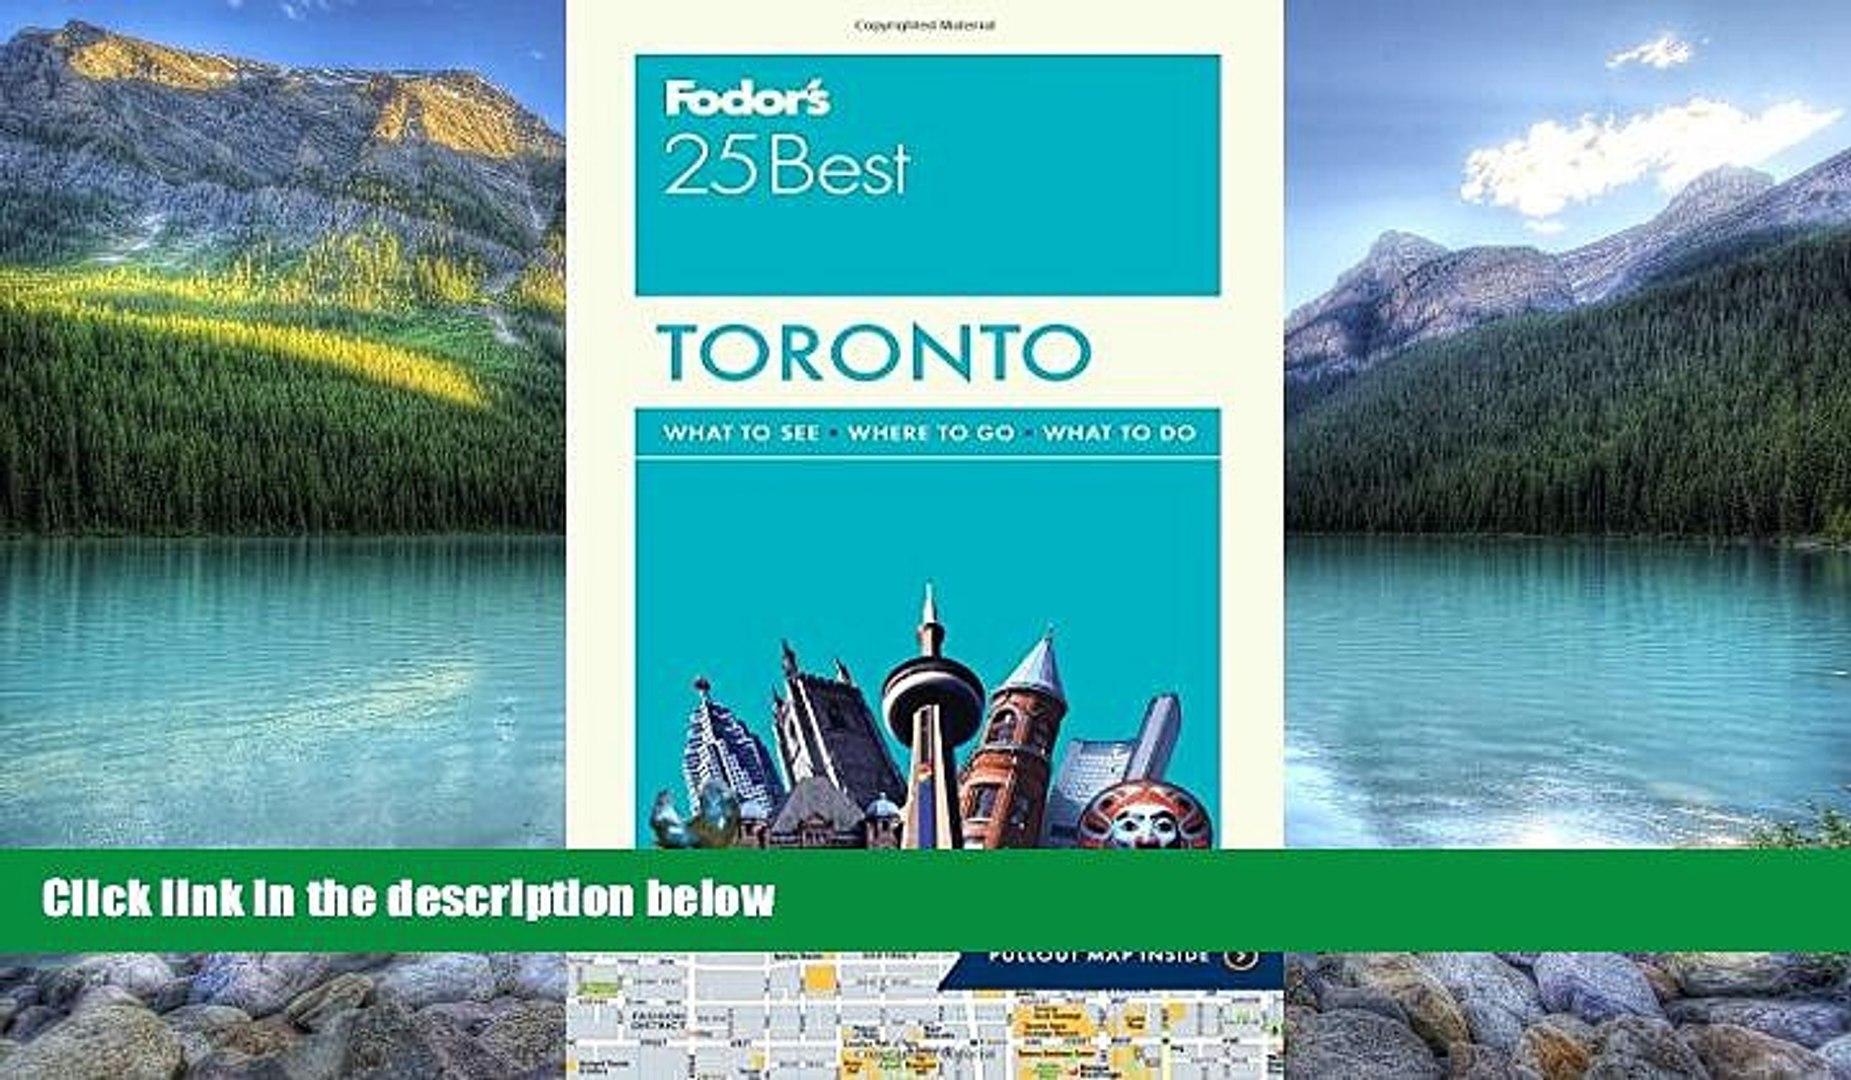 Fodors Toronto 25 Best